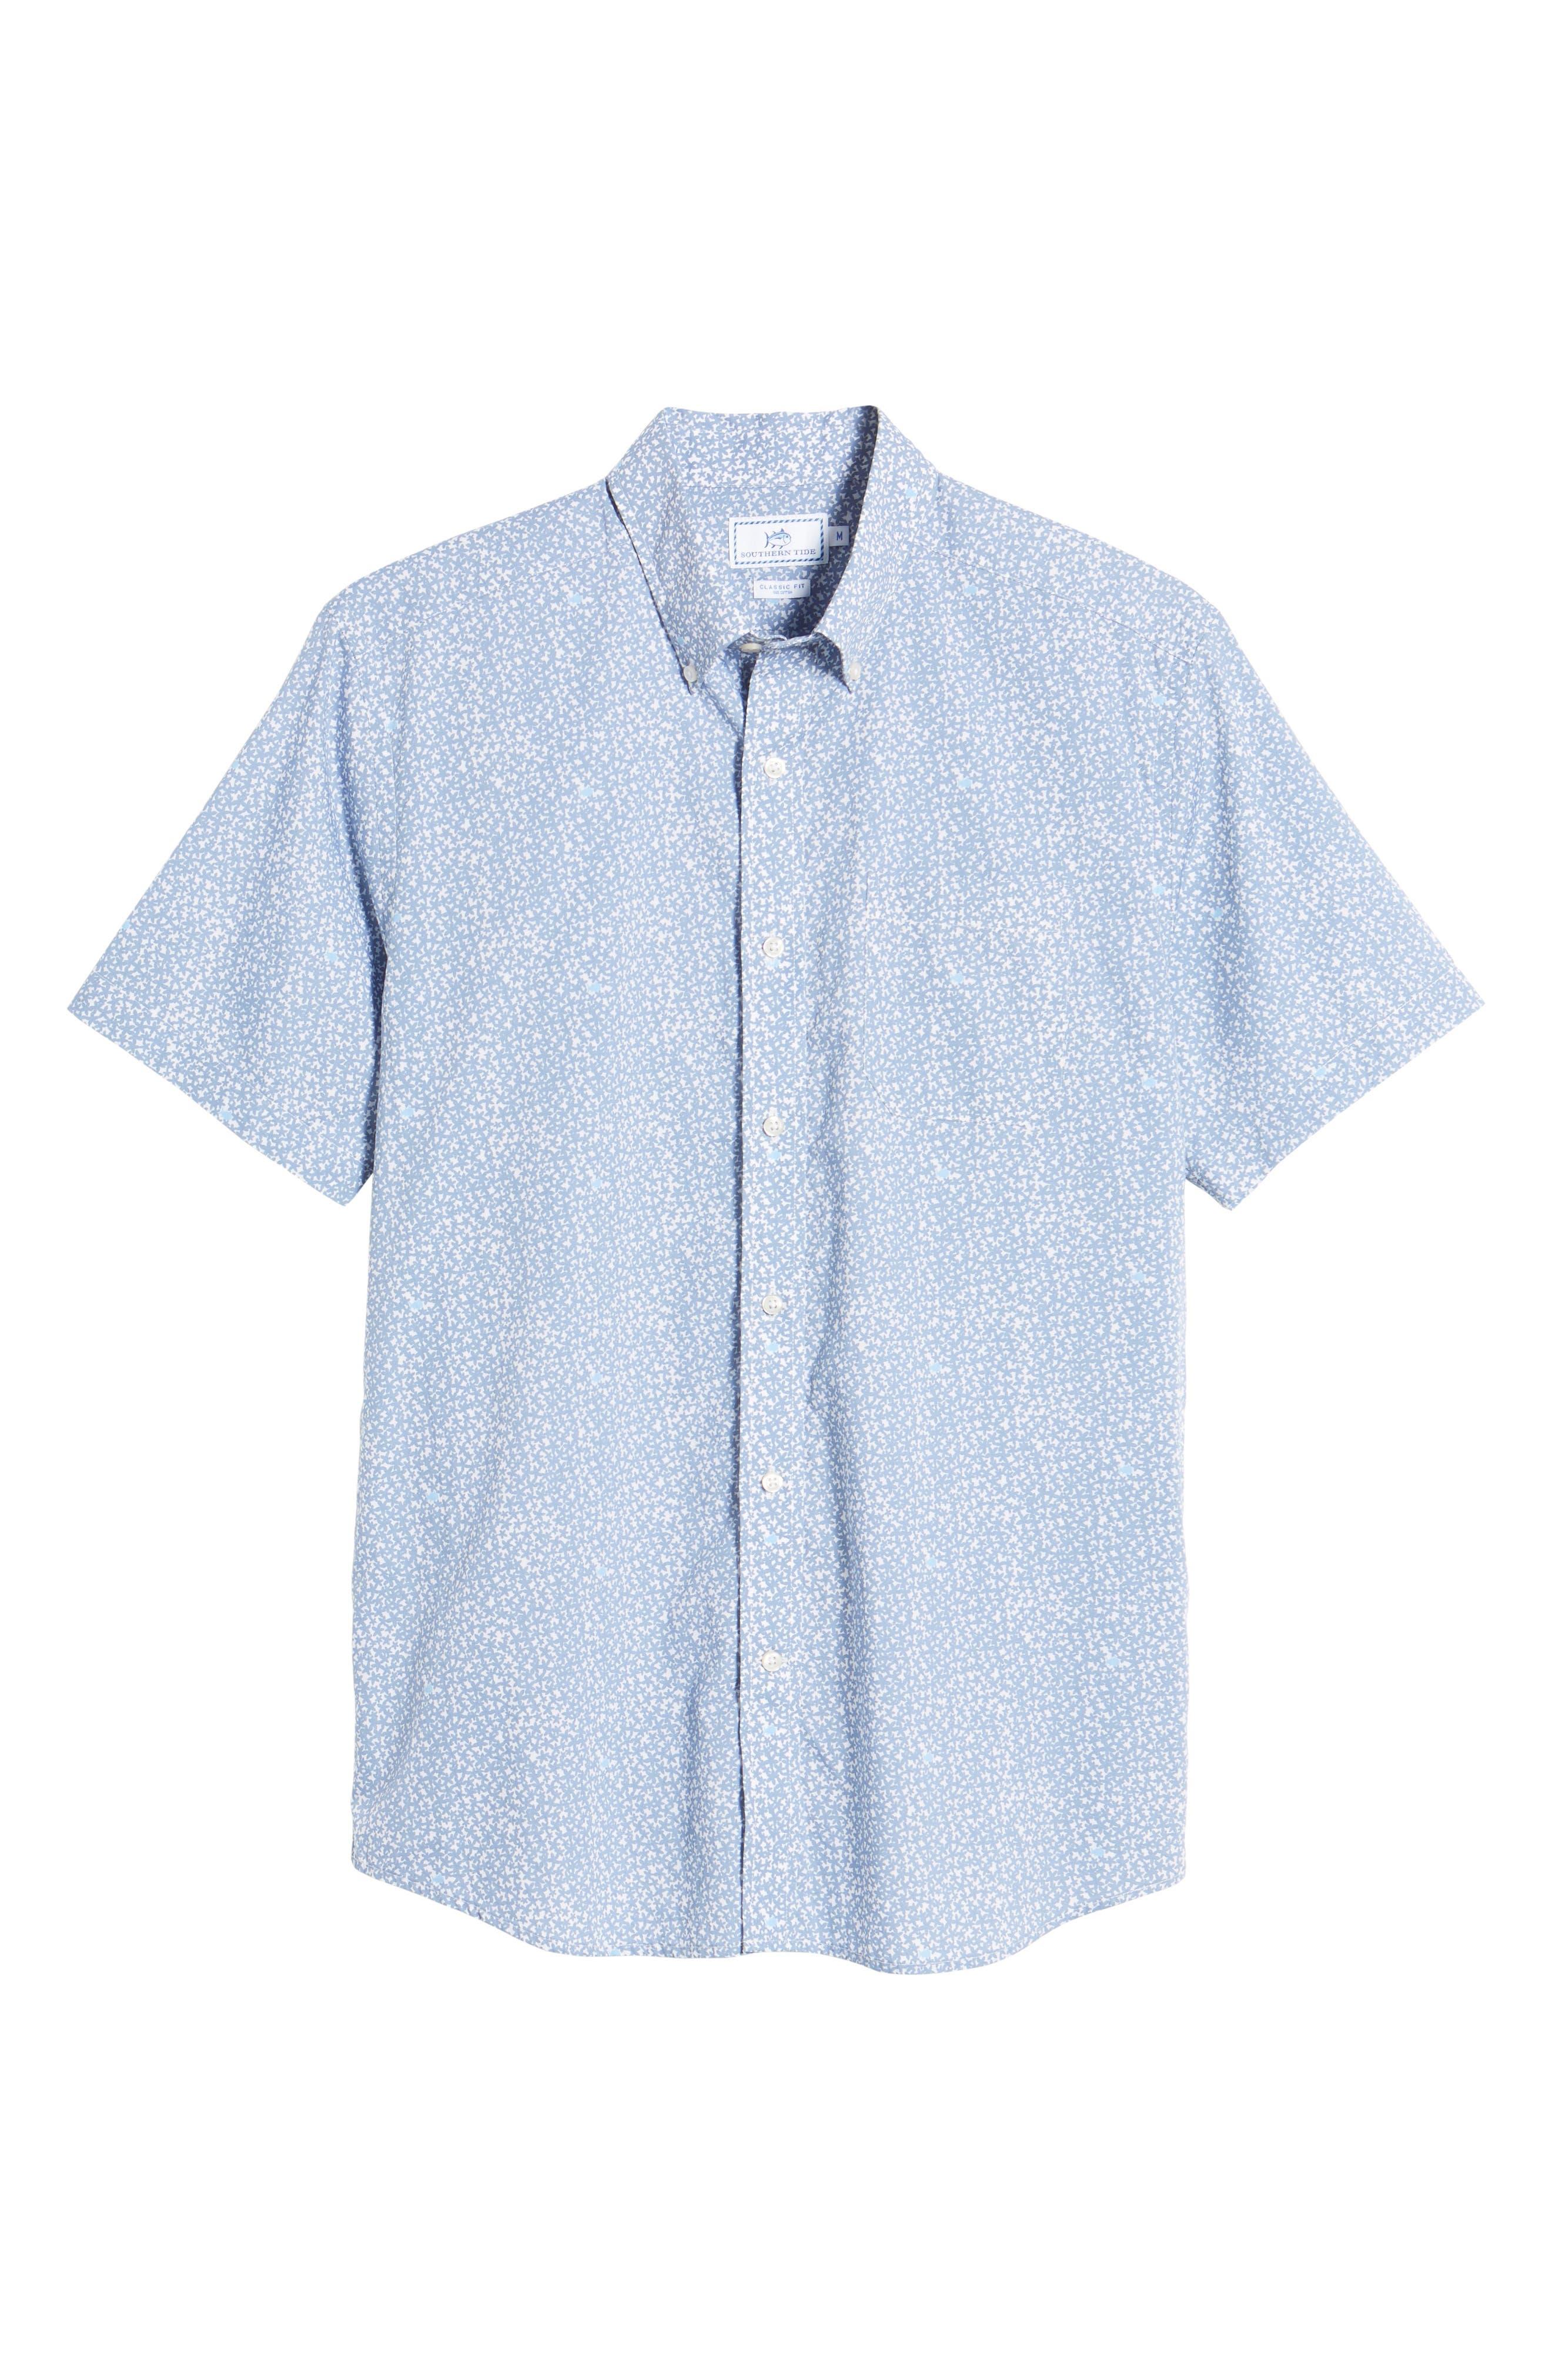 Dover Beach Regular Fit Print Sport Shirt,                             Alternate thumbnail 6, color,                             020